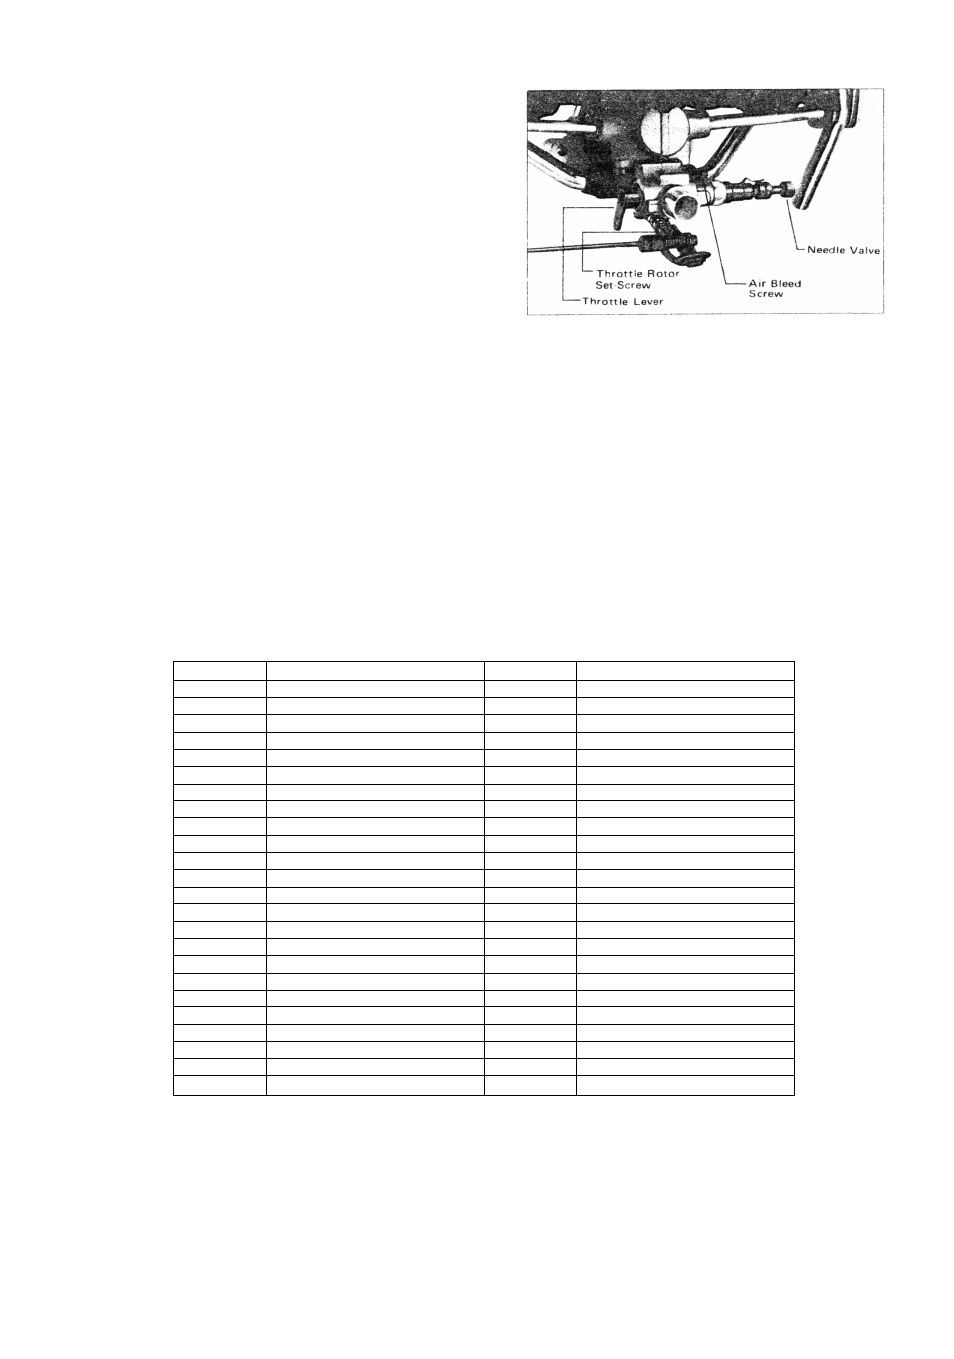 os engine manual browse manual guides u2022 rh trufflefries co Chauvet Mega Strobe FX12 Chauvet Mega Strobe FX12